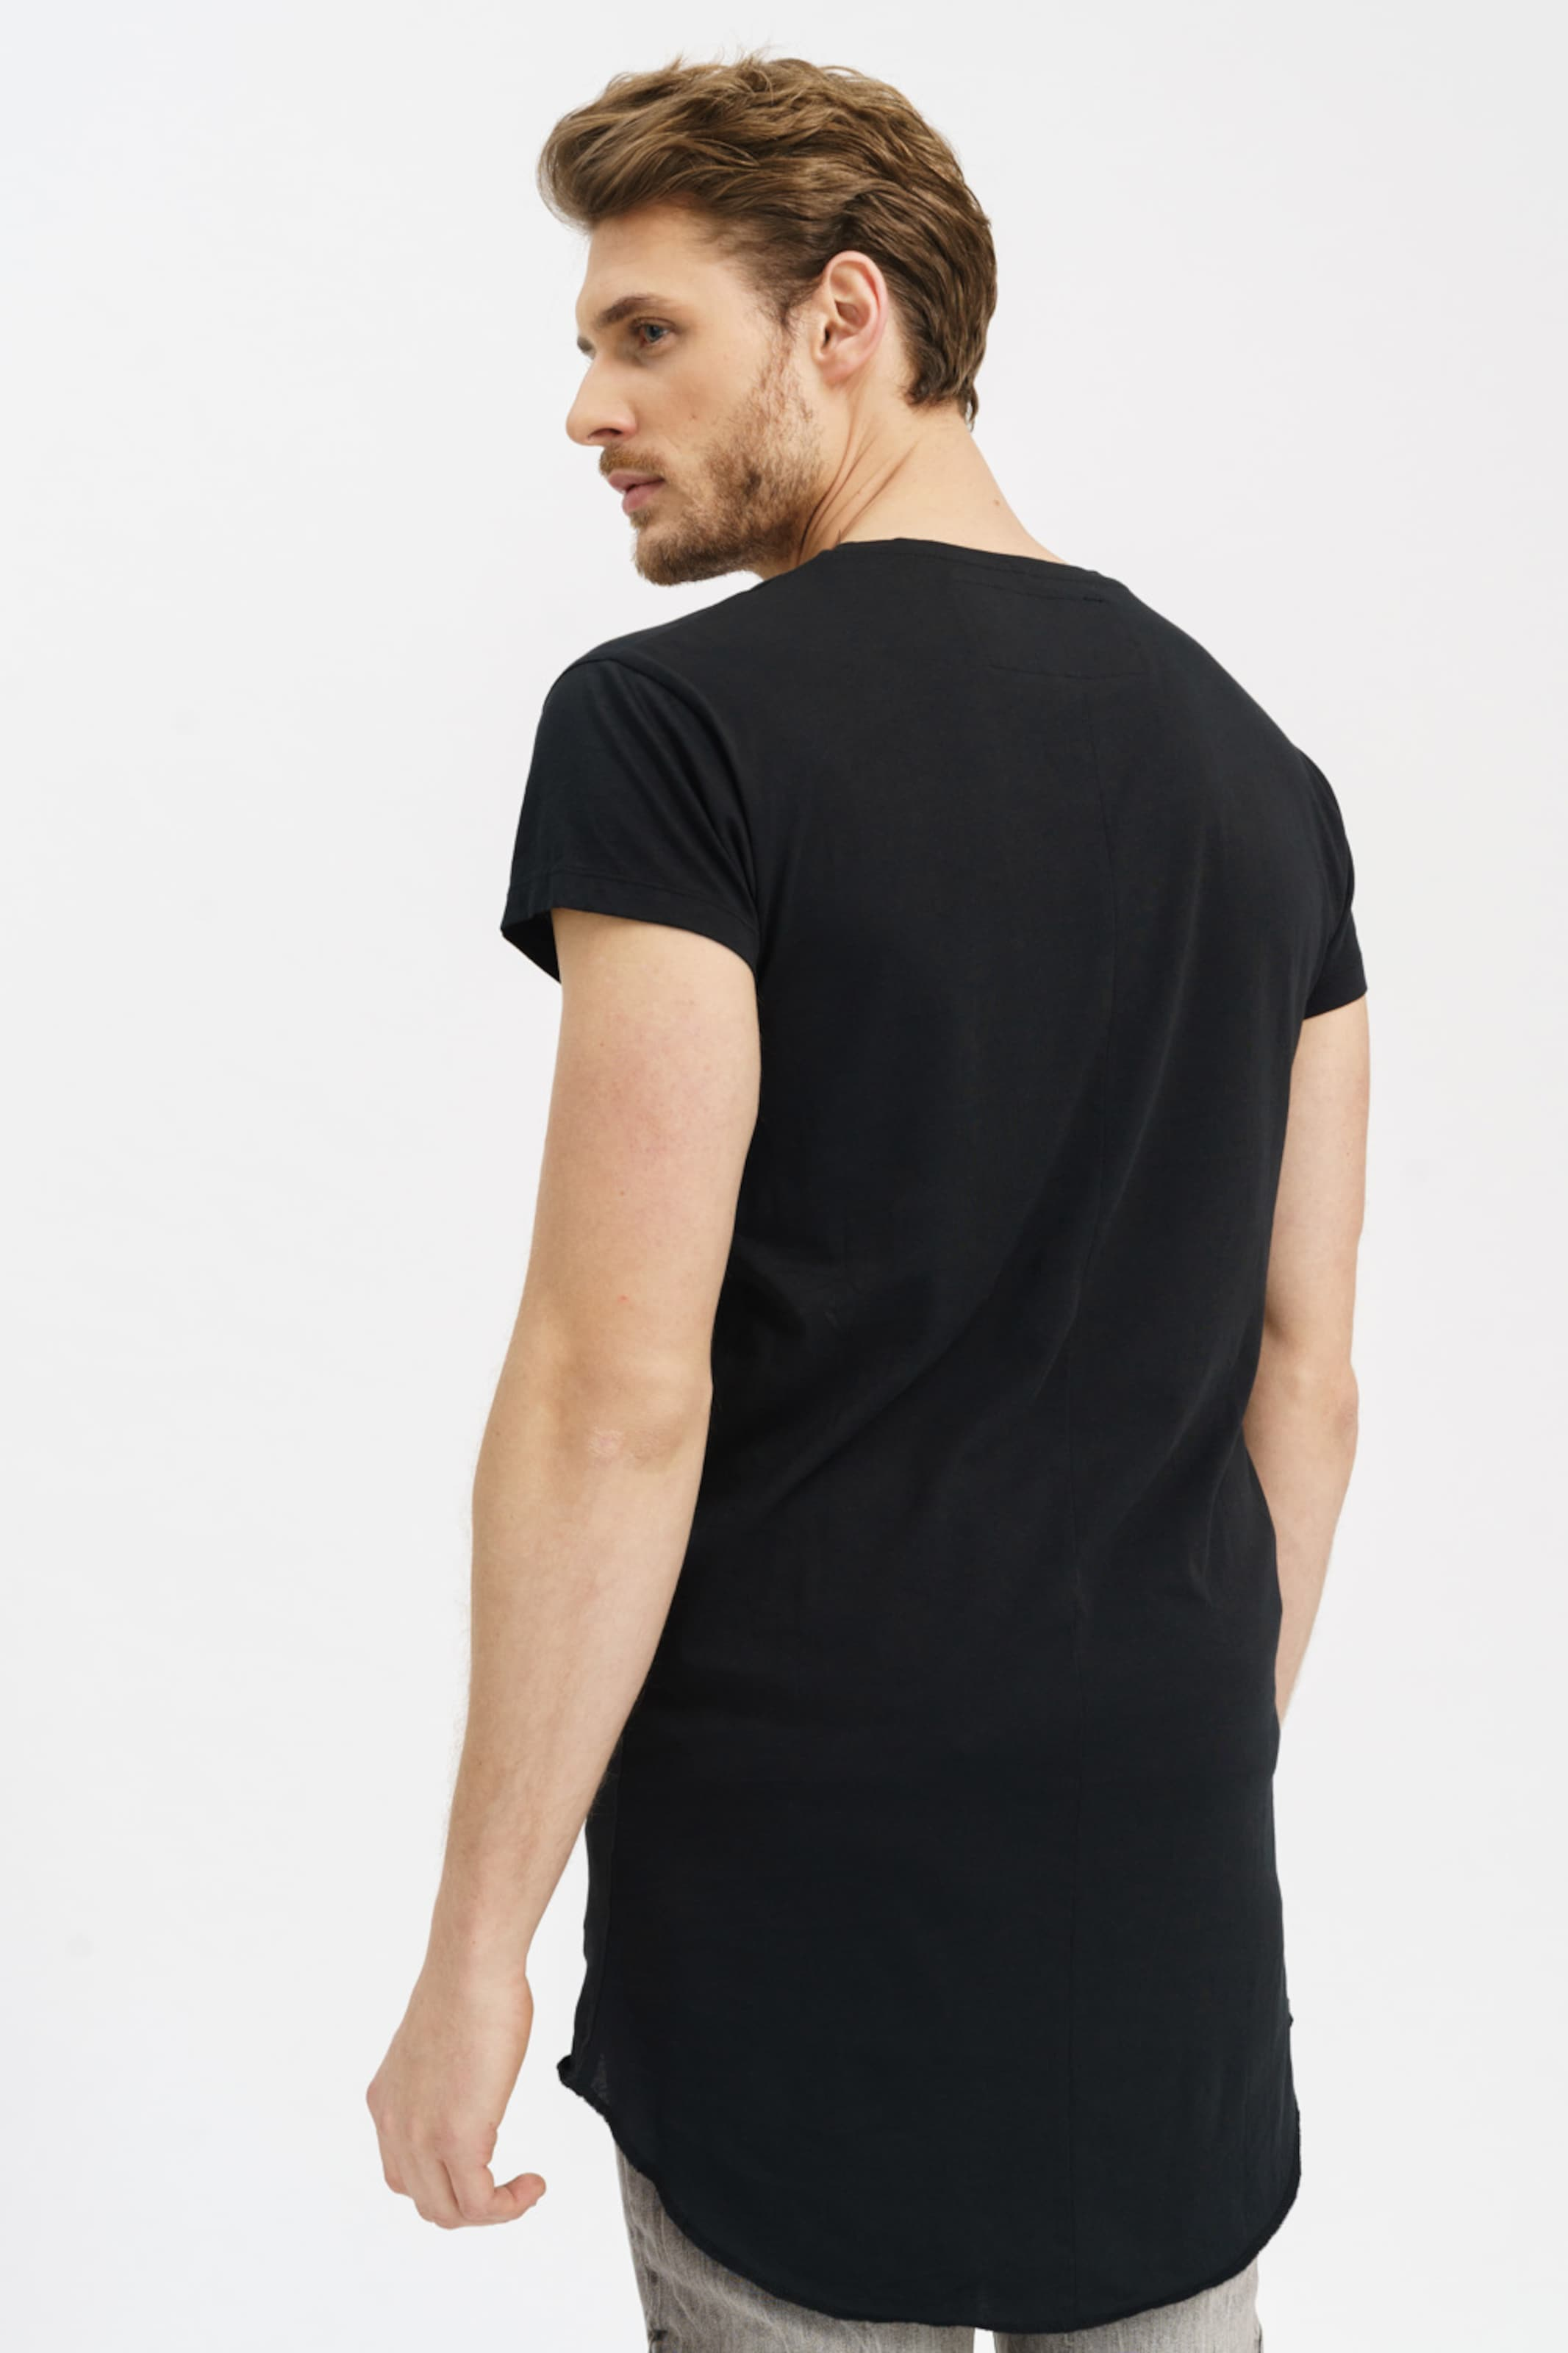 Trueprodigy T Summer In shirt Schwarz 'basic 1' UzMSVp